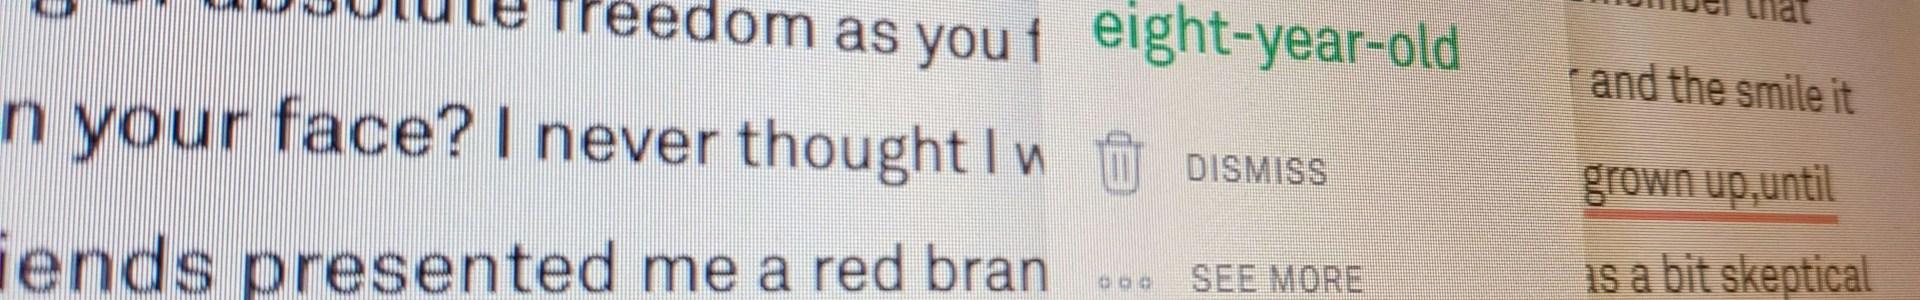 TOOL: Grammarly love